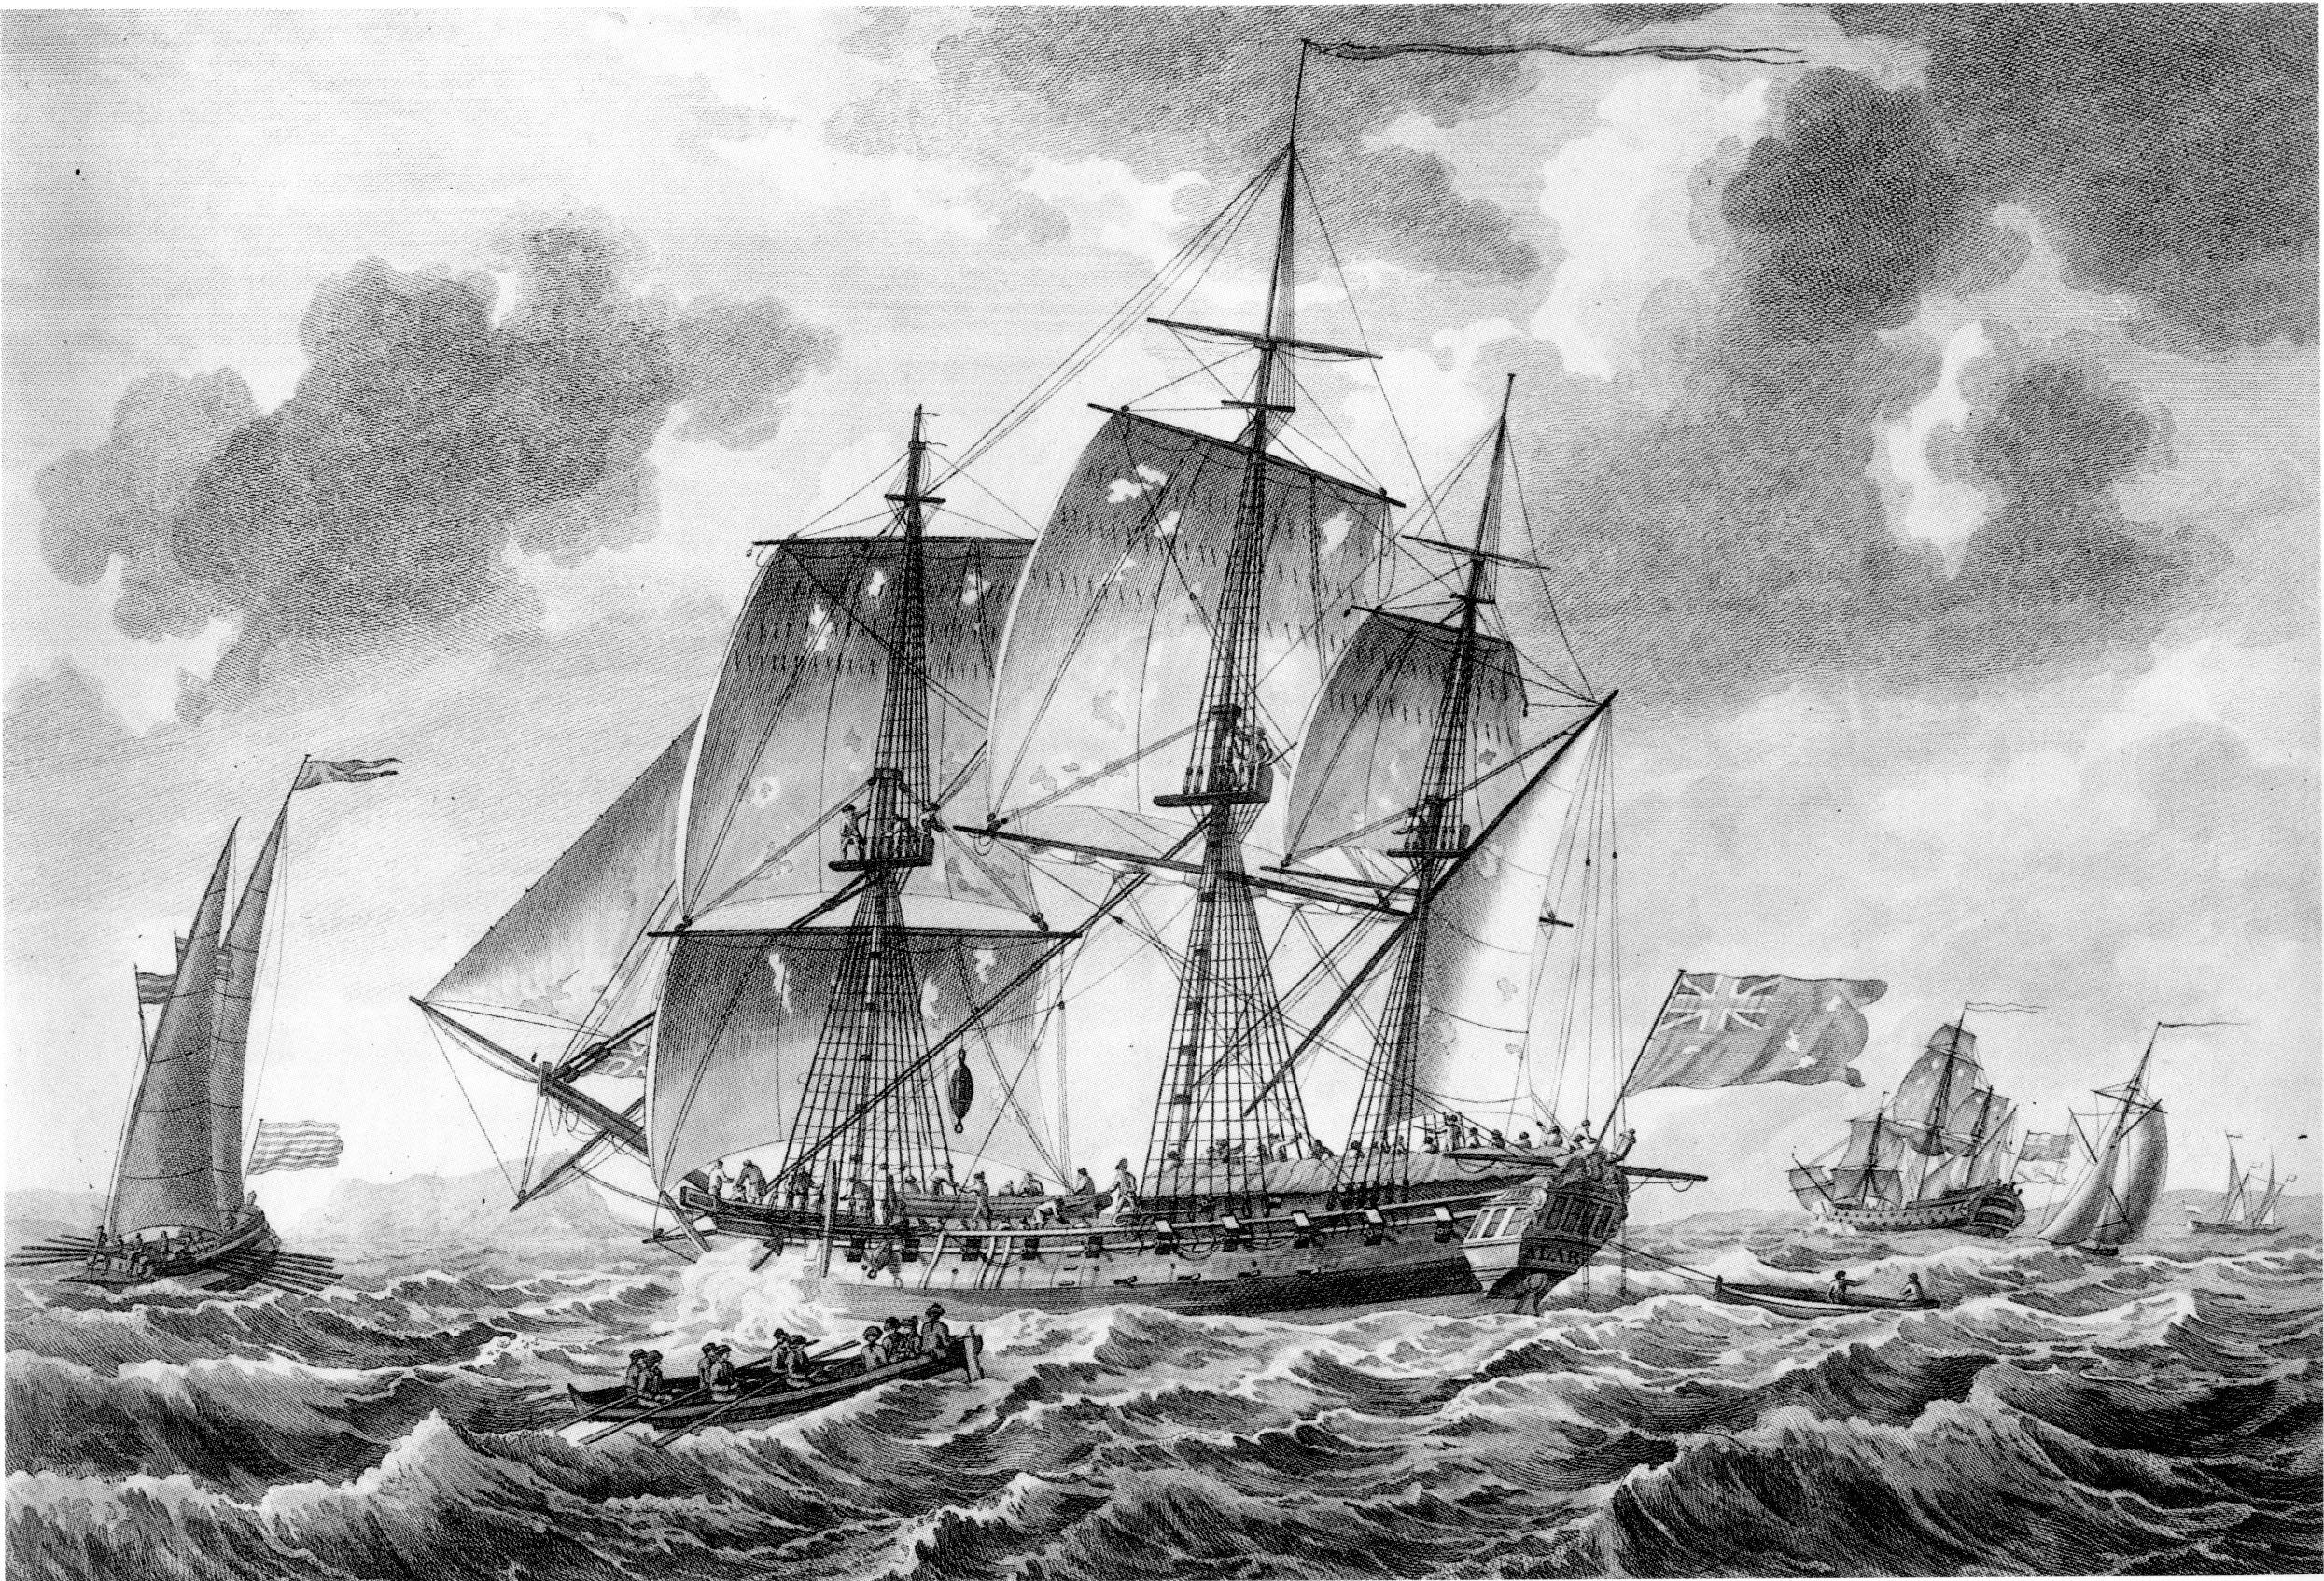 File:HMS Alarm (1758).jpg